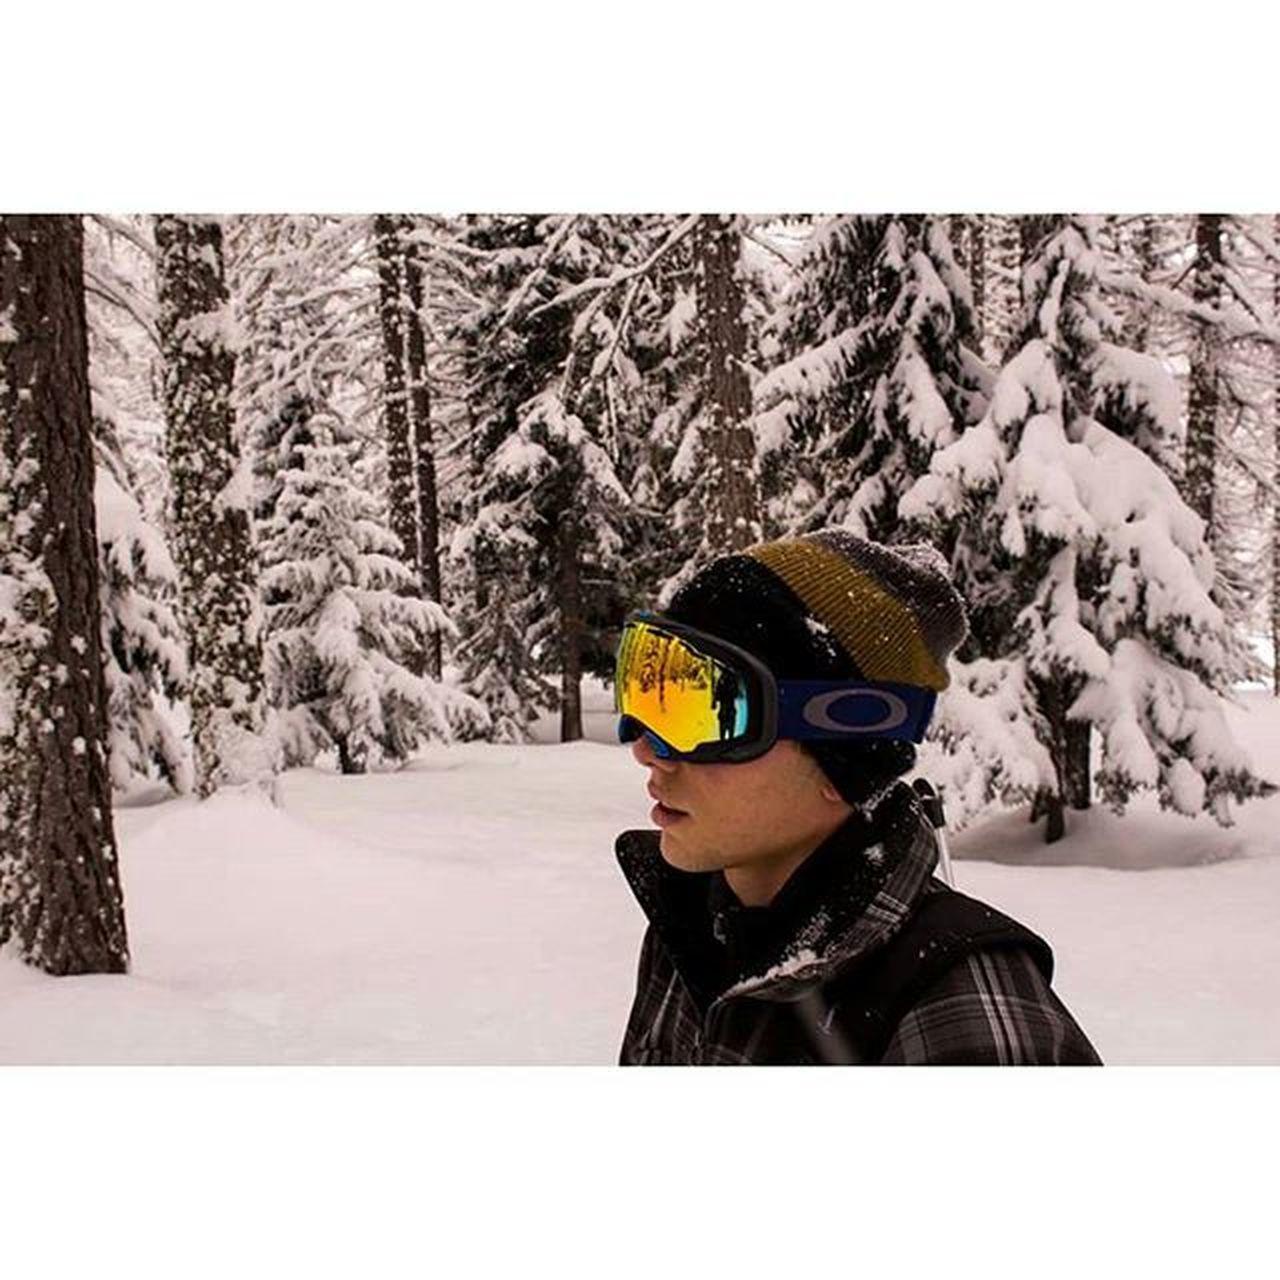 Ready for The season ❄ Winter Ready Readyforthesnow Snow Ski Snowboard Oakley Goggles Color Colorful Gold White Wood Armada Salomon Gopro Happines Freedom Soul